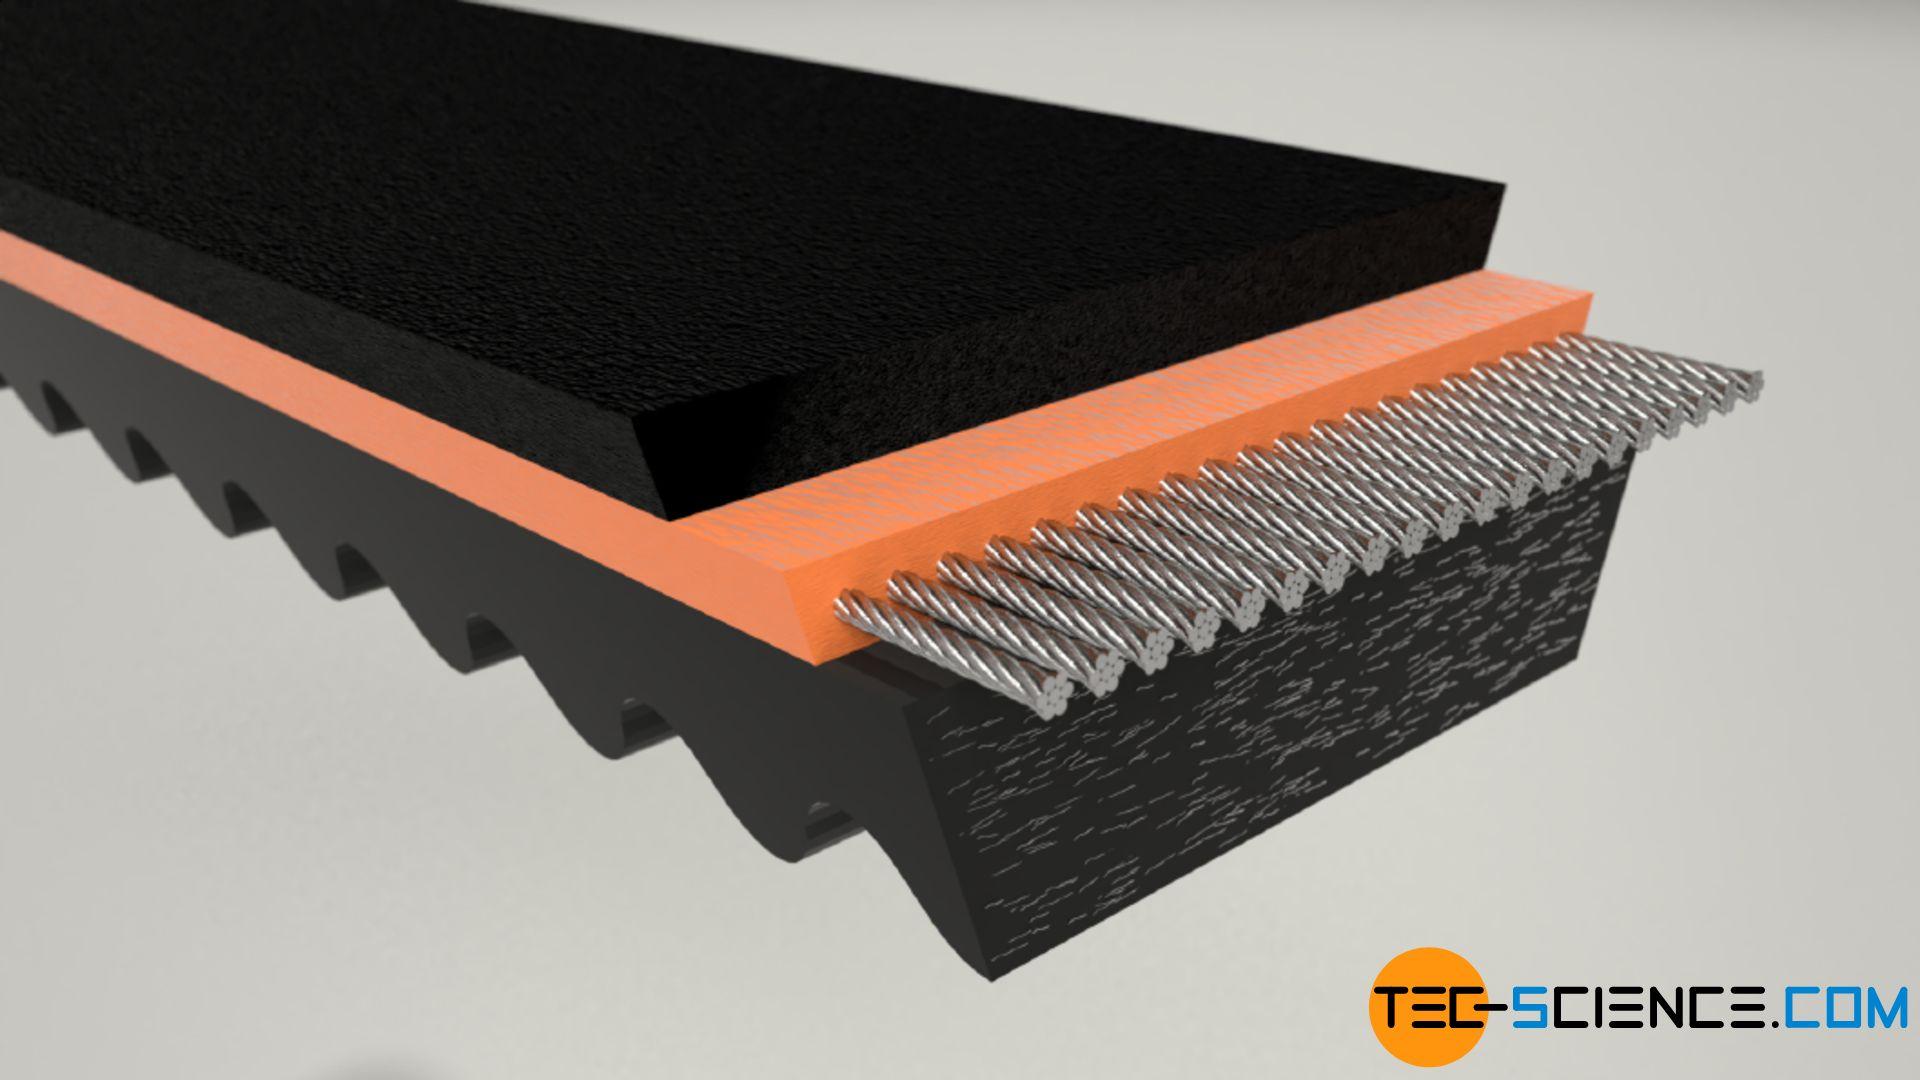 Raw edge wide v-belt (variable speed belt)